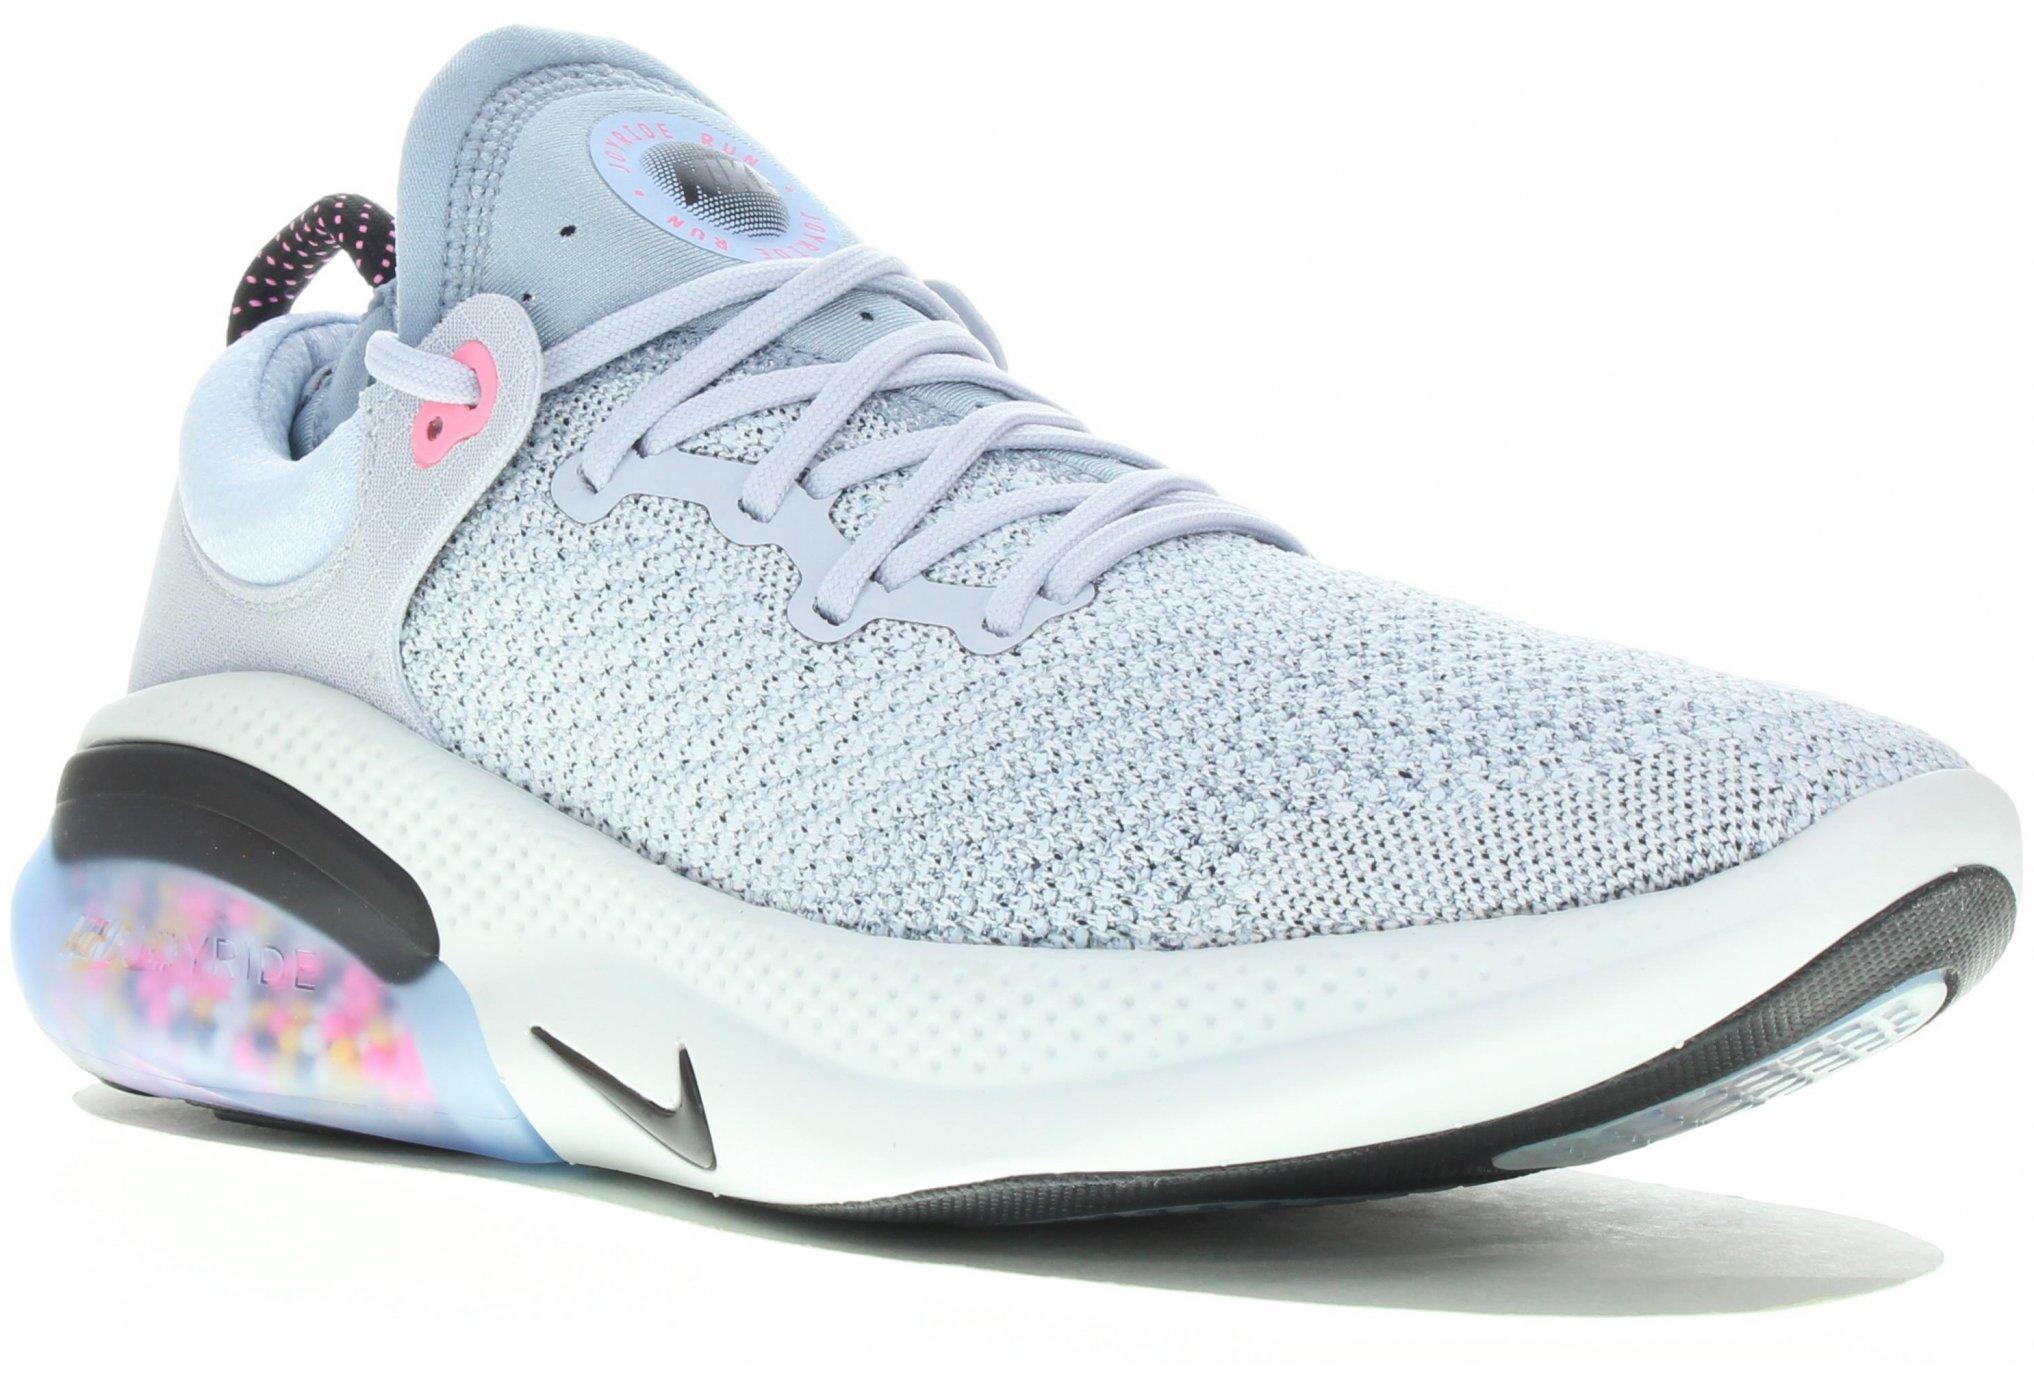 Nike Joyride Run Flyknit M Diététique Chaussures homme